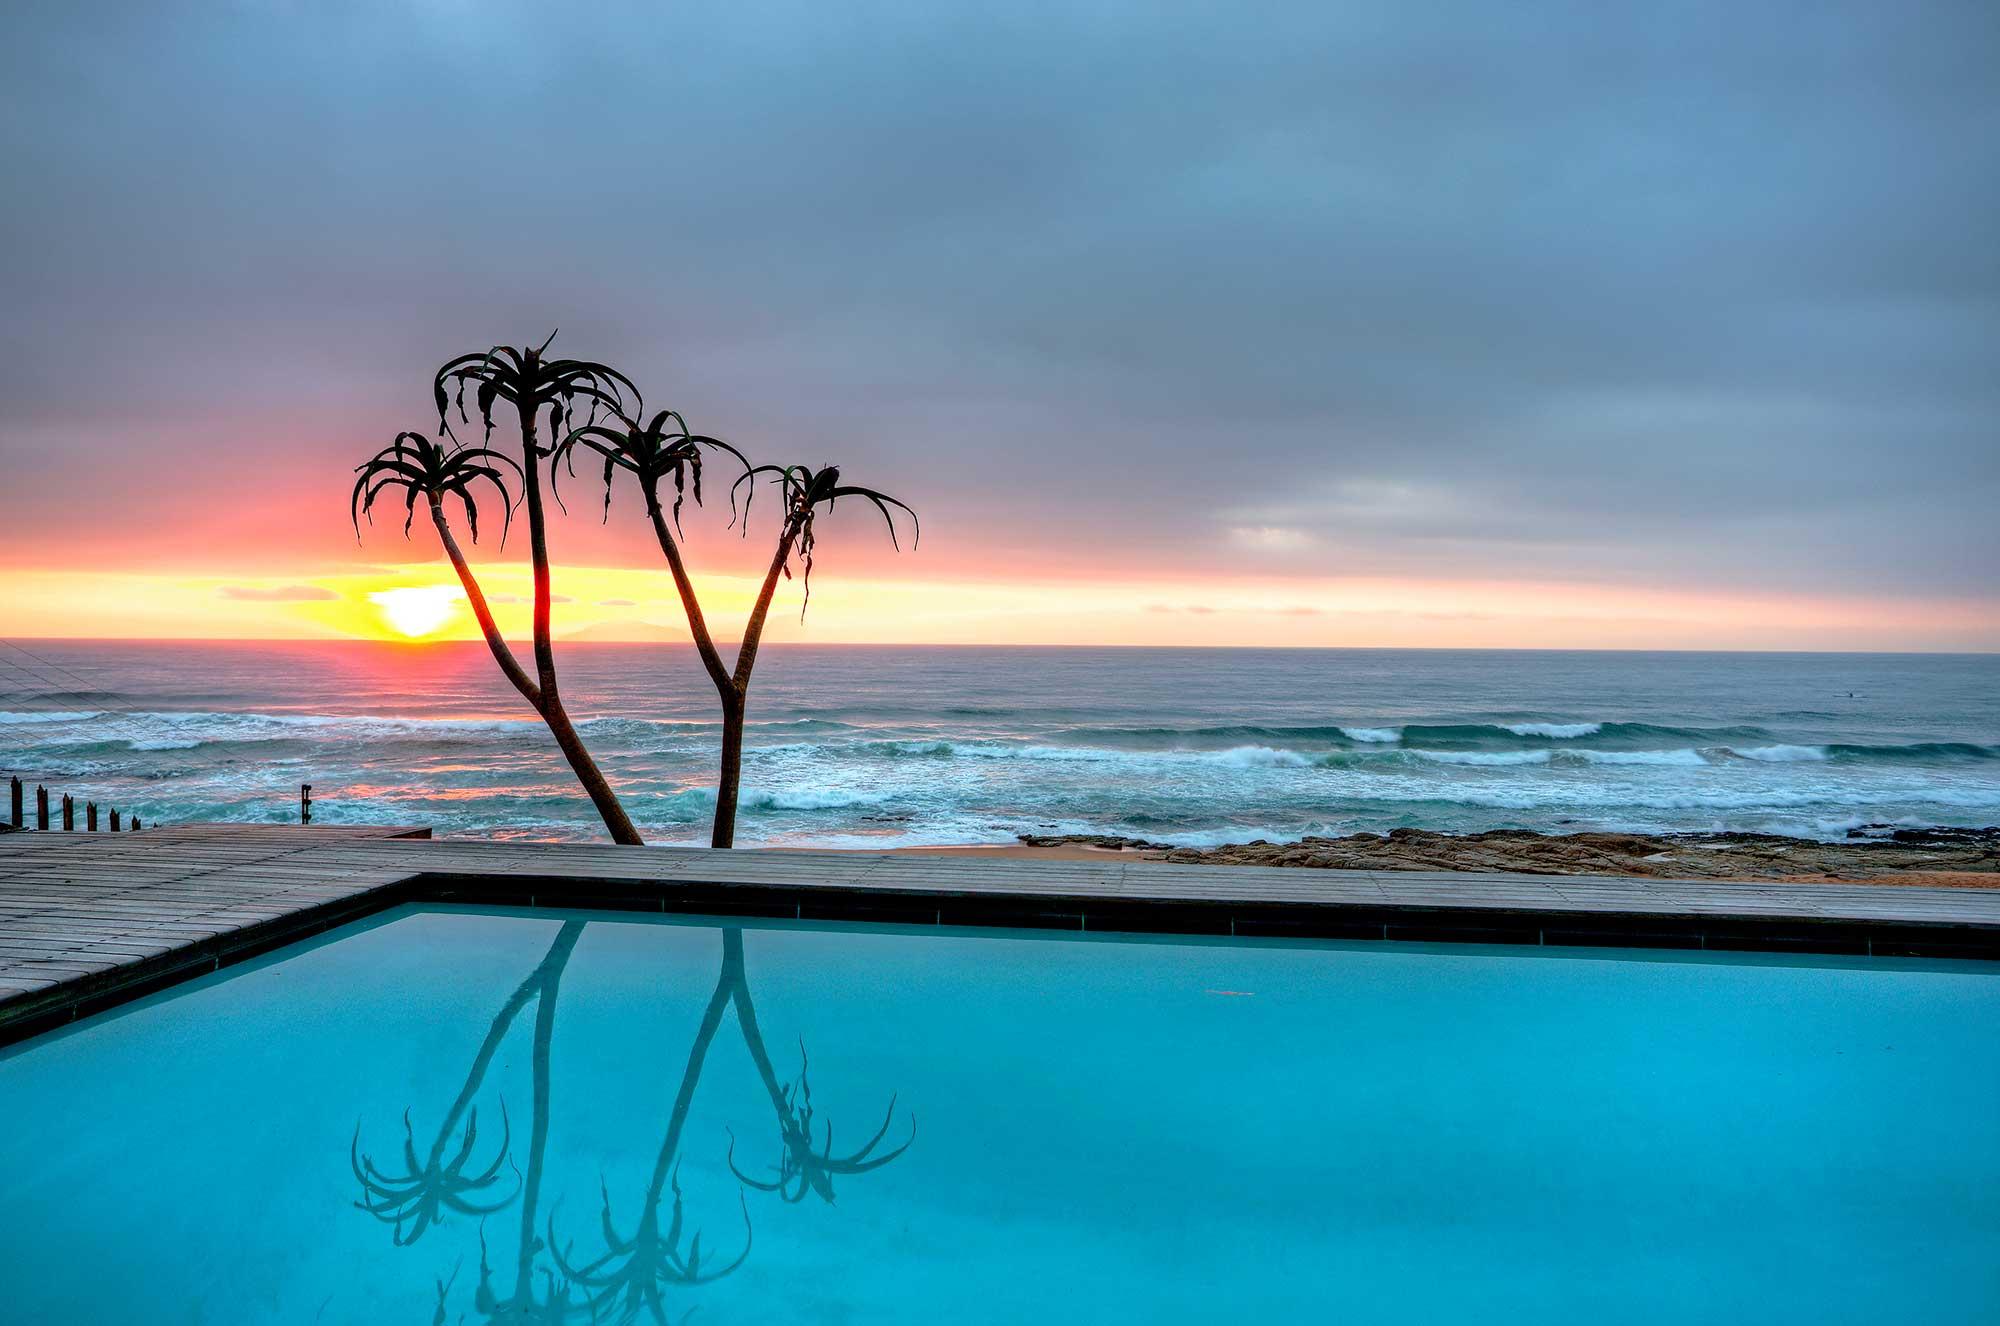 Canelands | Canelands Beach Club & Spa, Salt Rock, Dolphin Coast